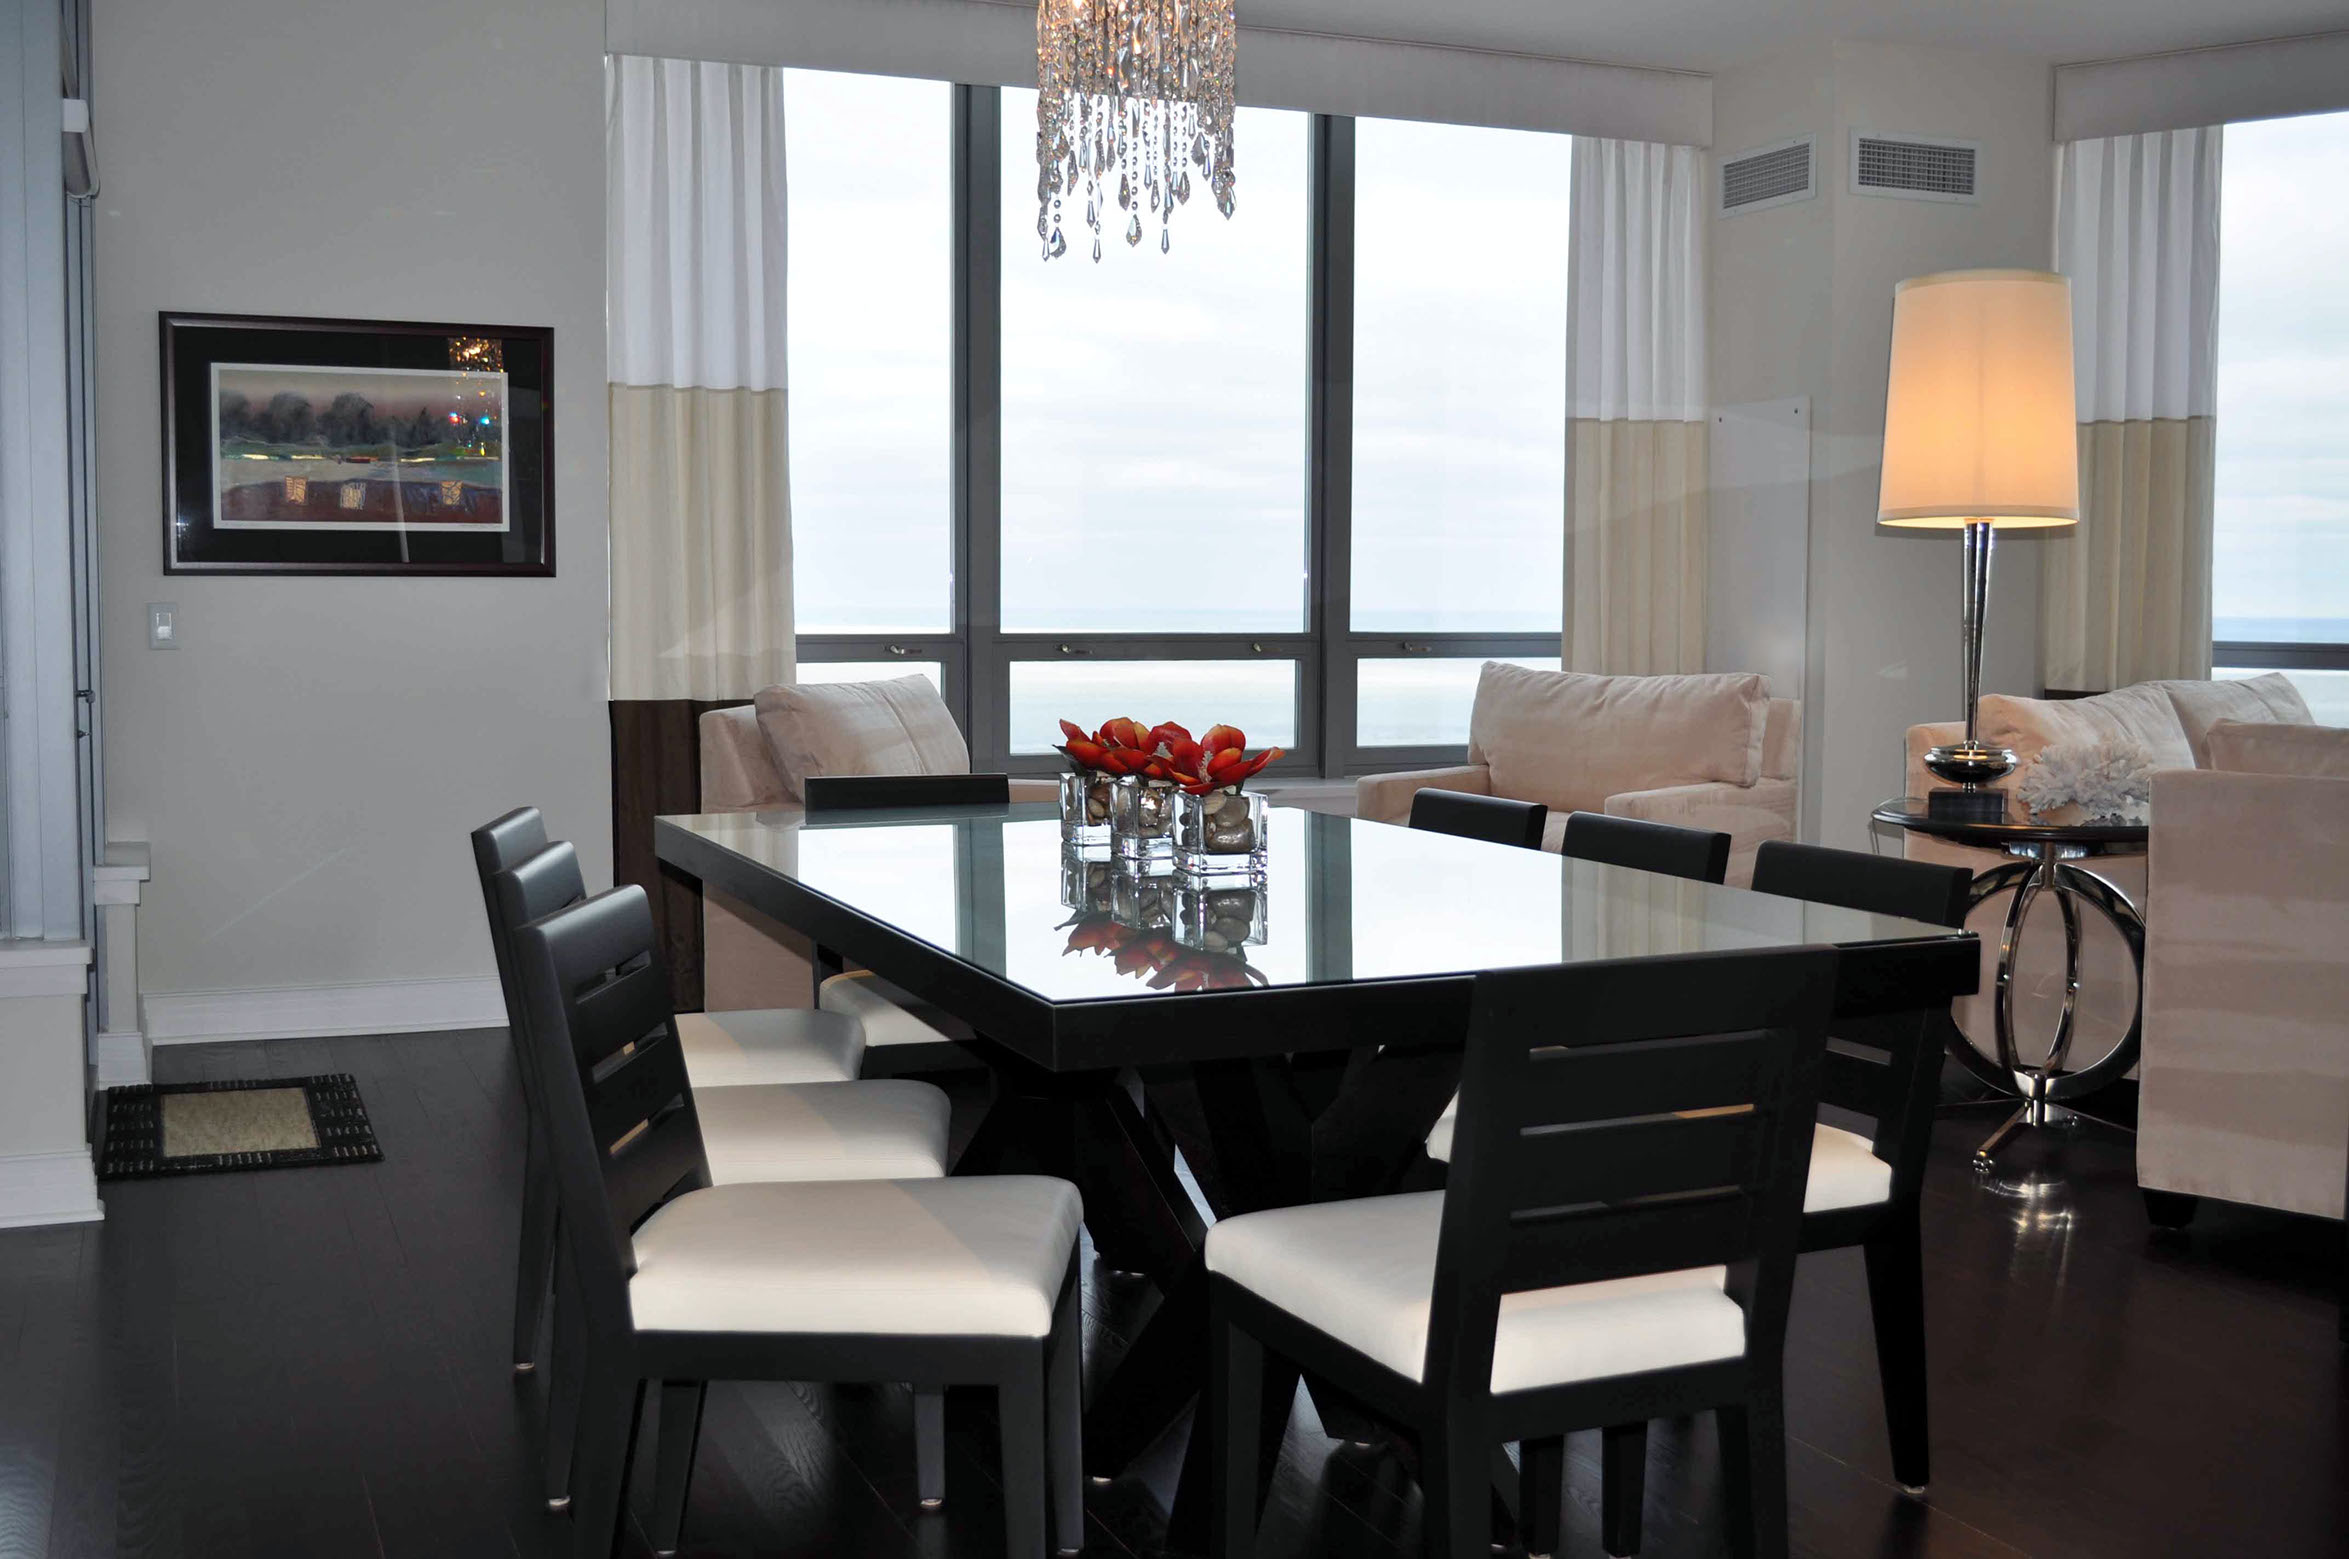 Elmhurst Kitchen Interior Design